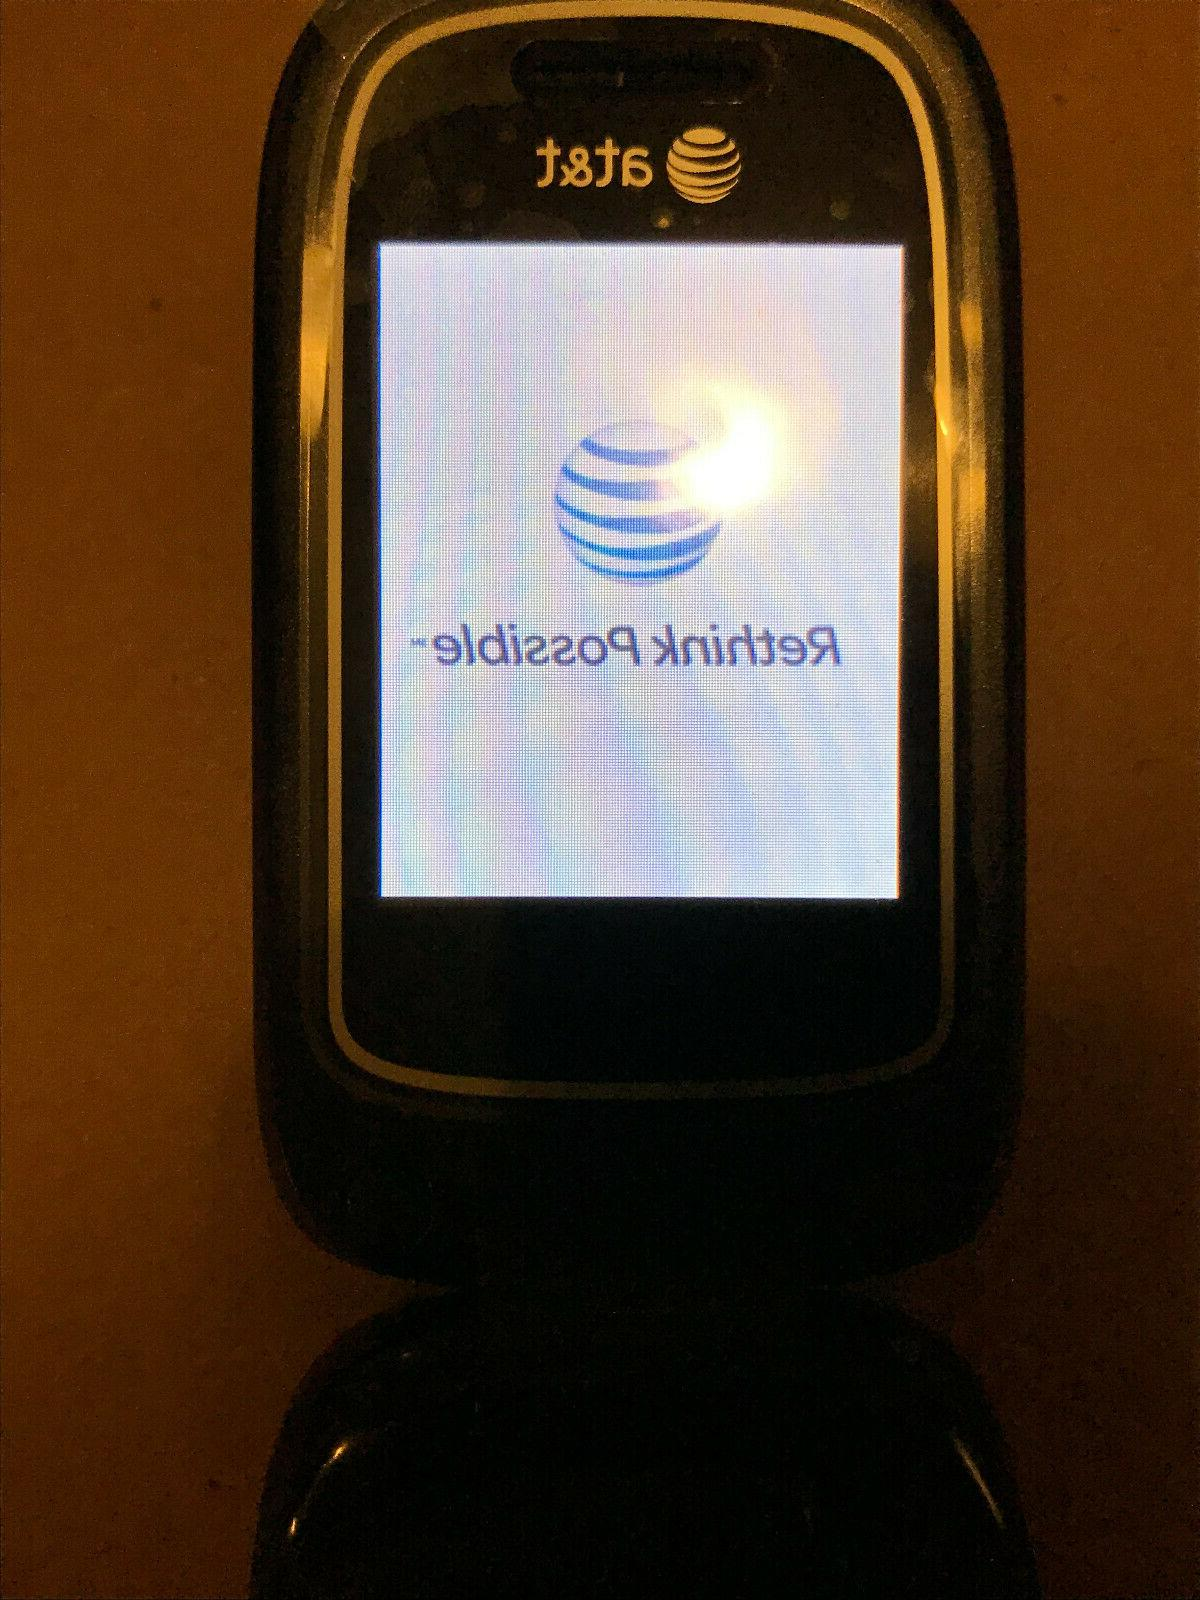 ZTE Z223 Flip Phone Brand New UNLOCKED For AT&T, T-Mobile, S